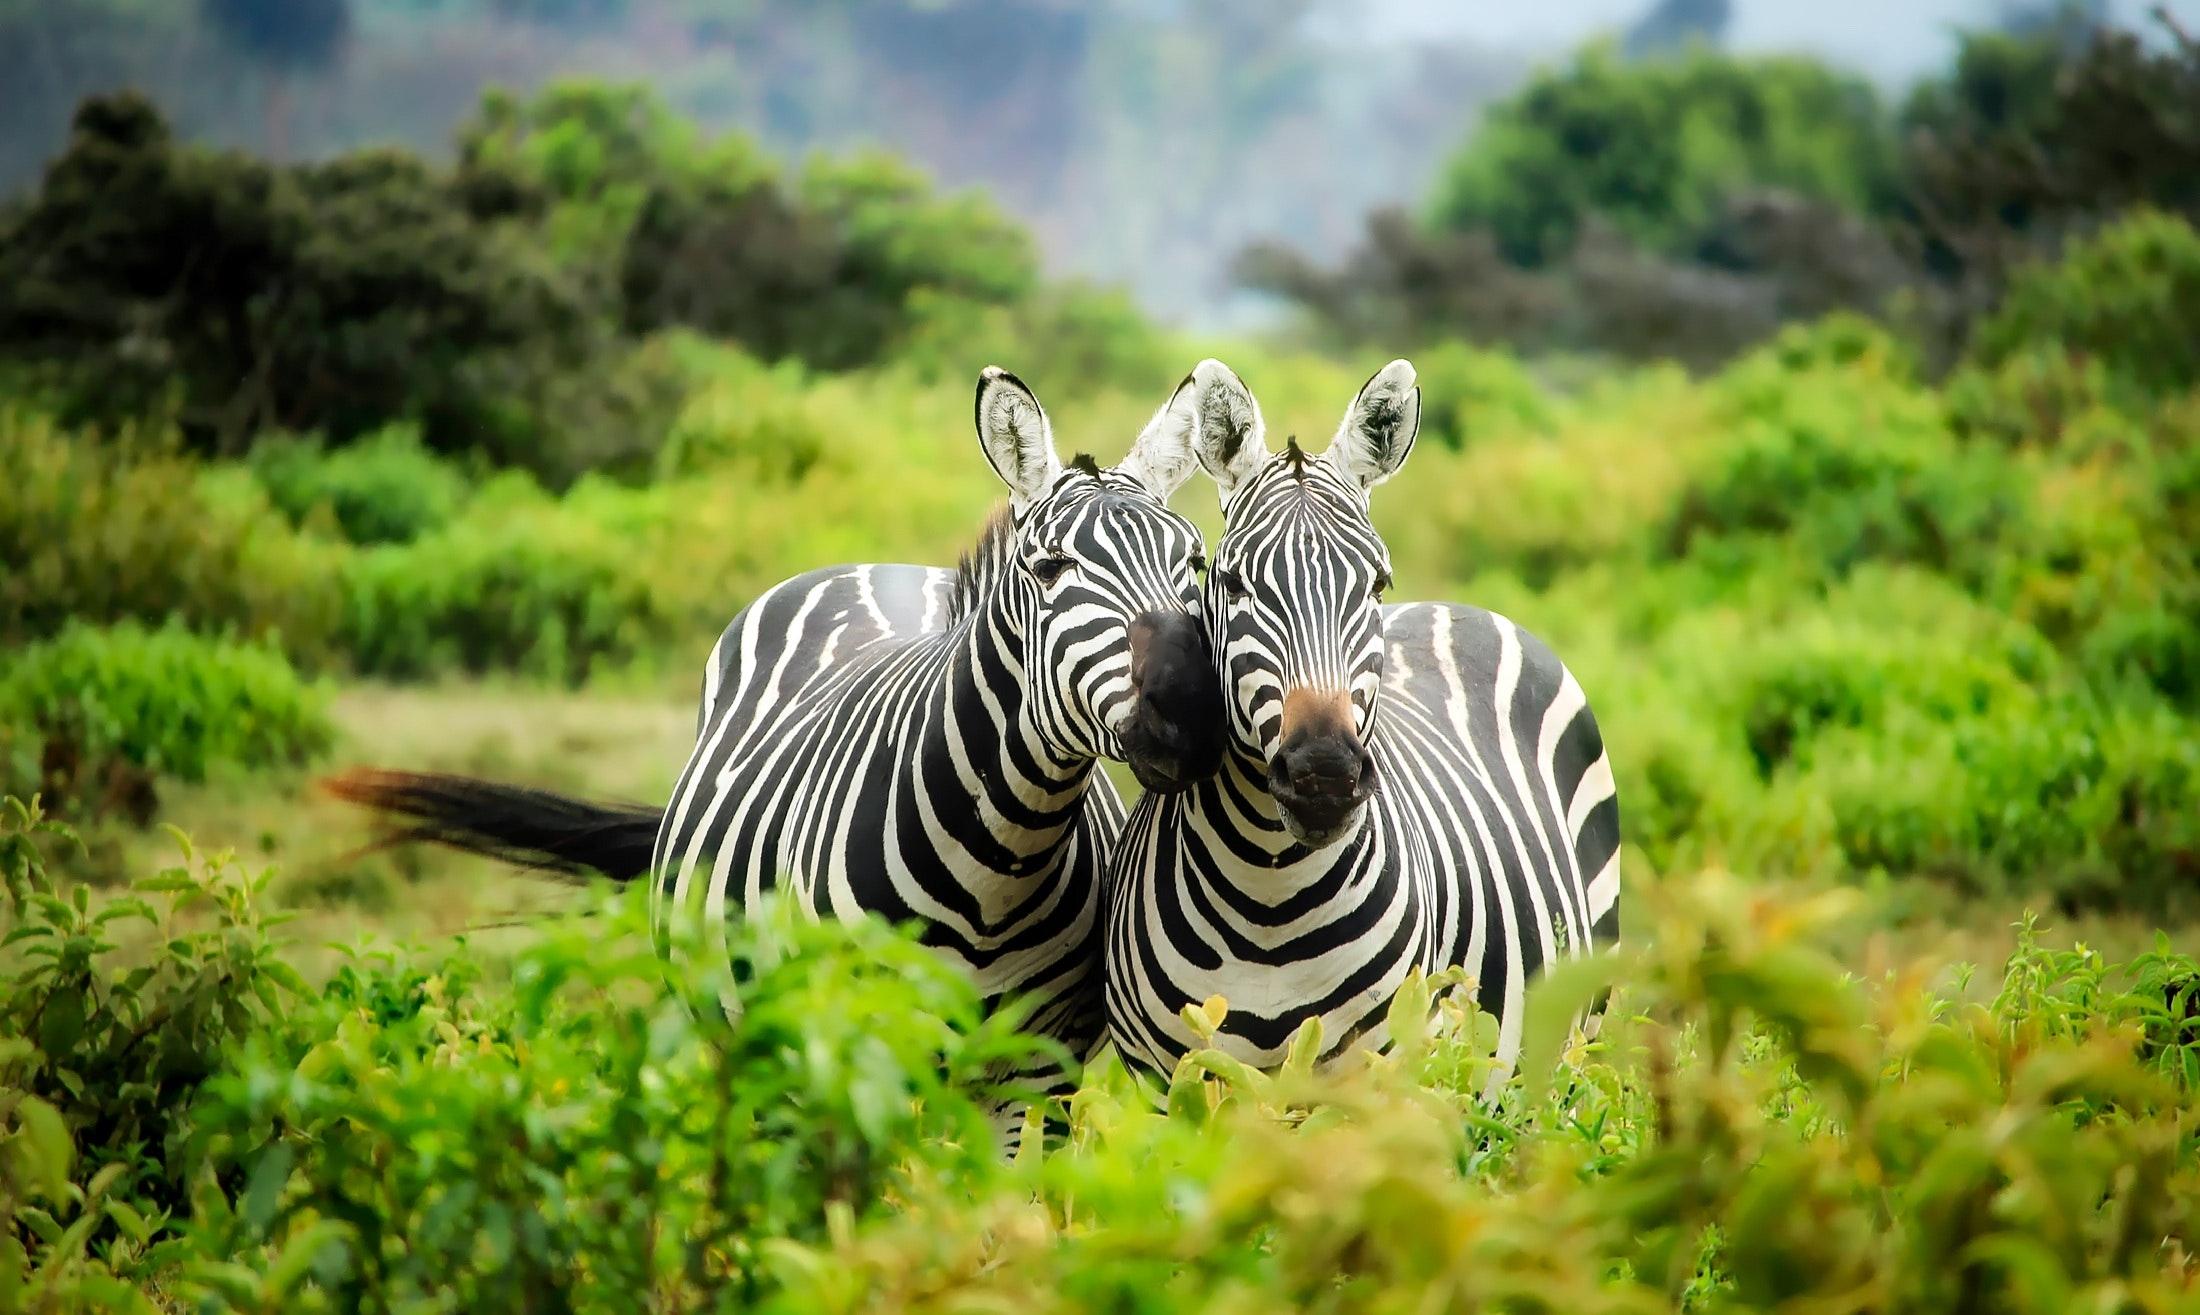 download wallpaper: zebras wallpaper